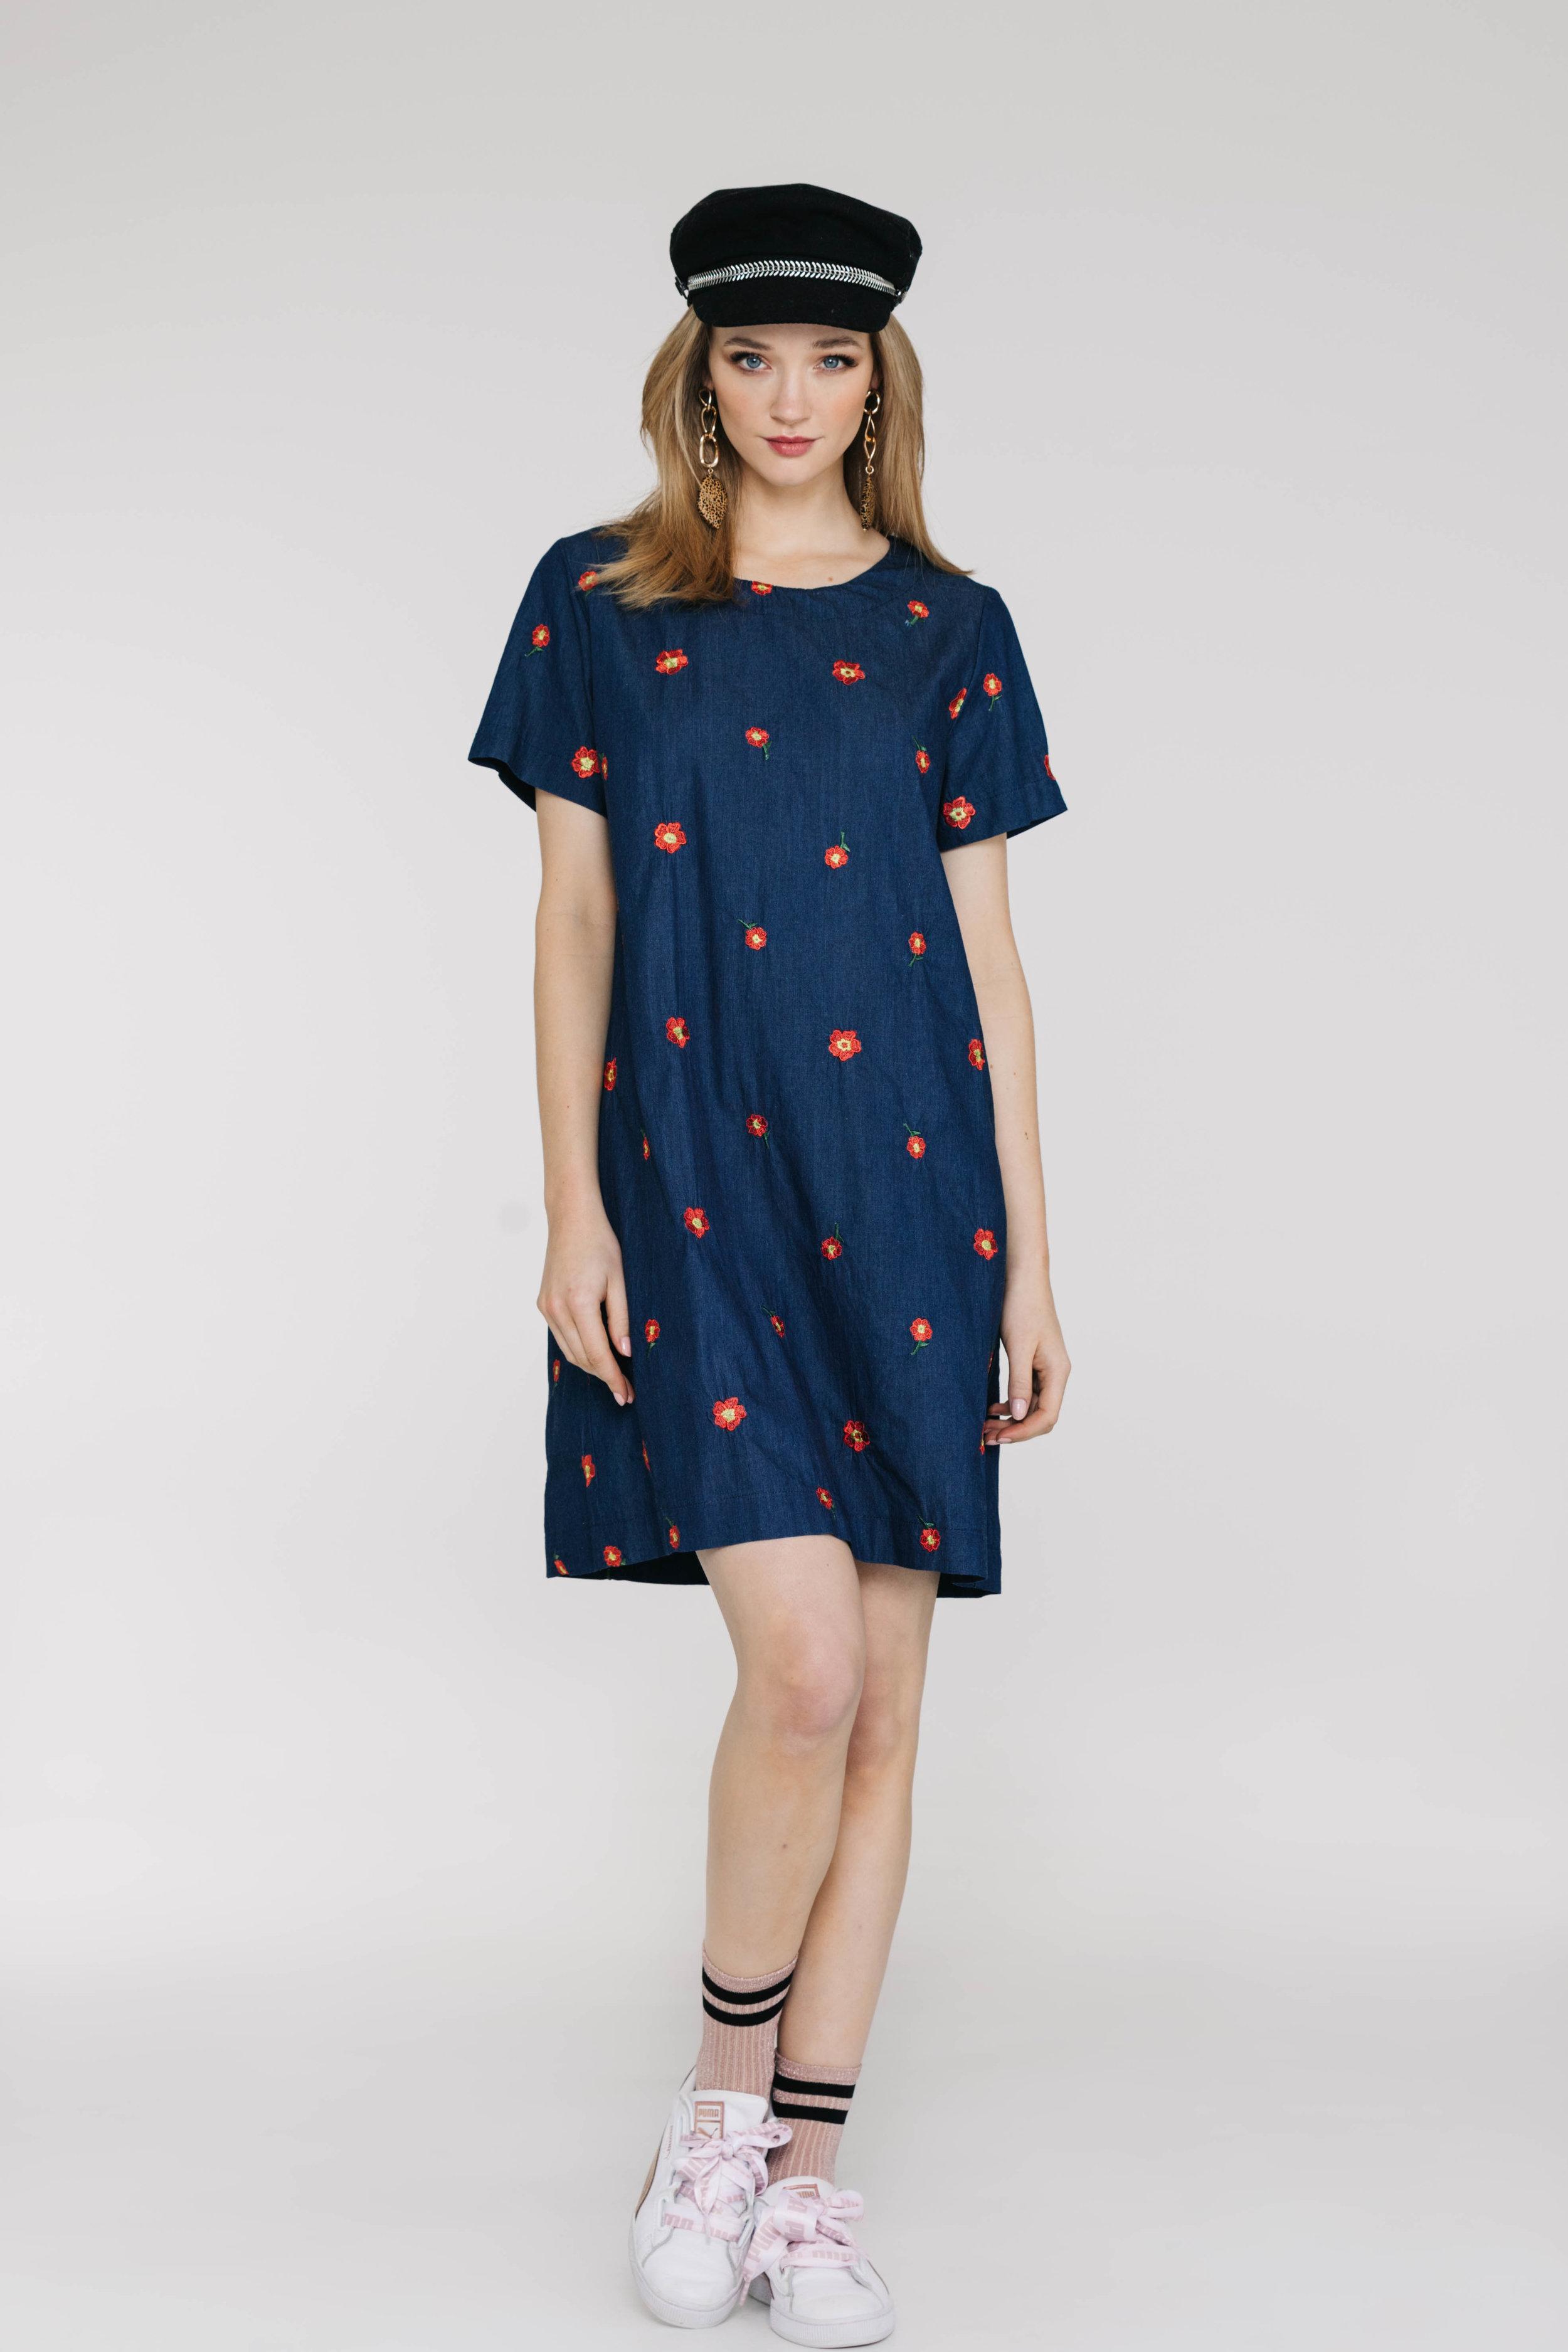 Factory Dress 6019N Dark Denim